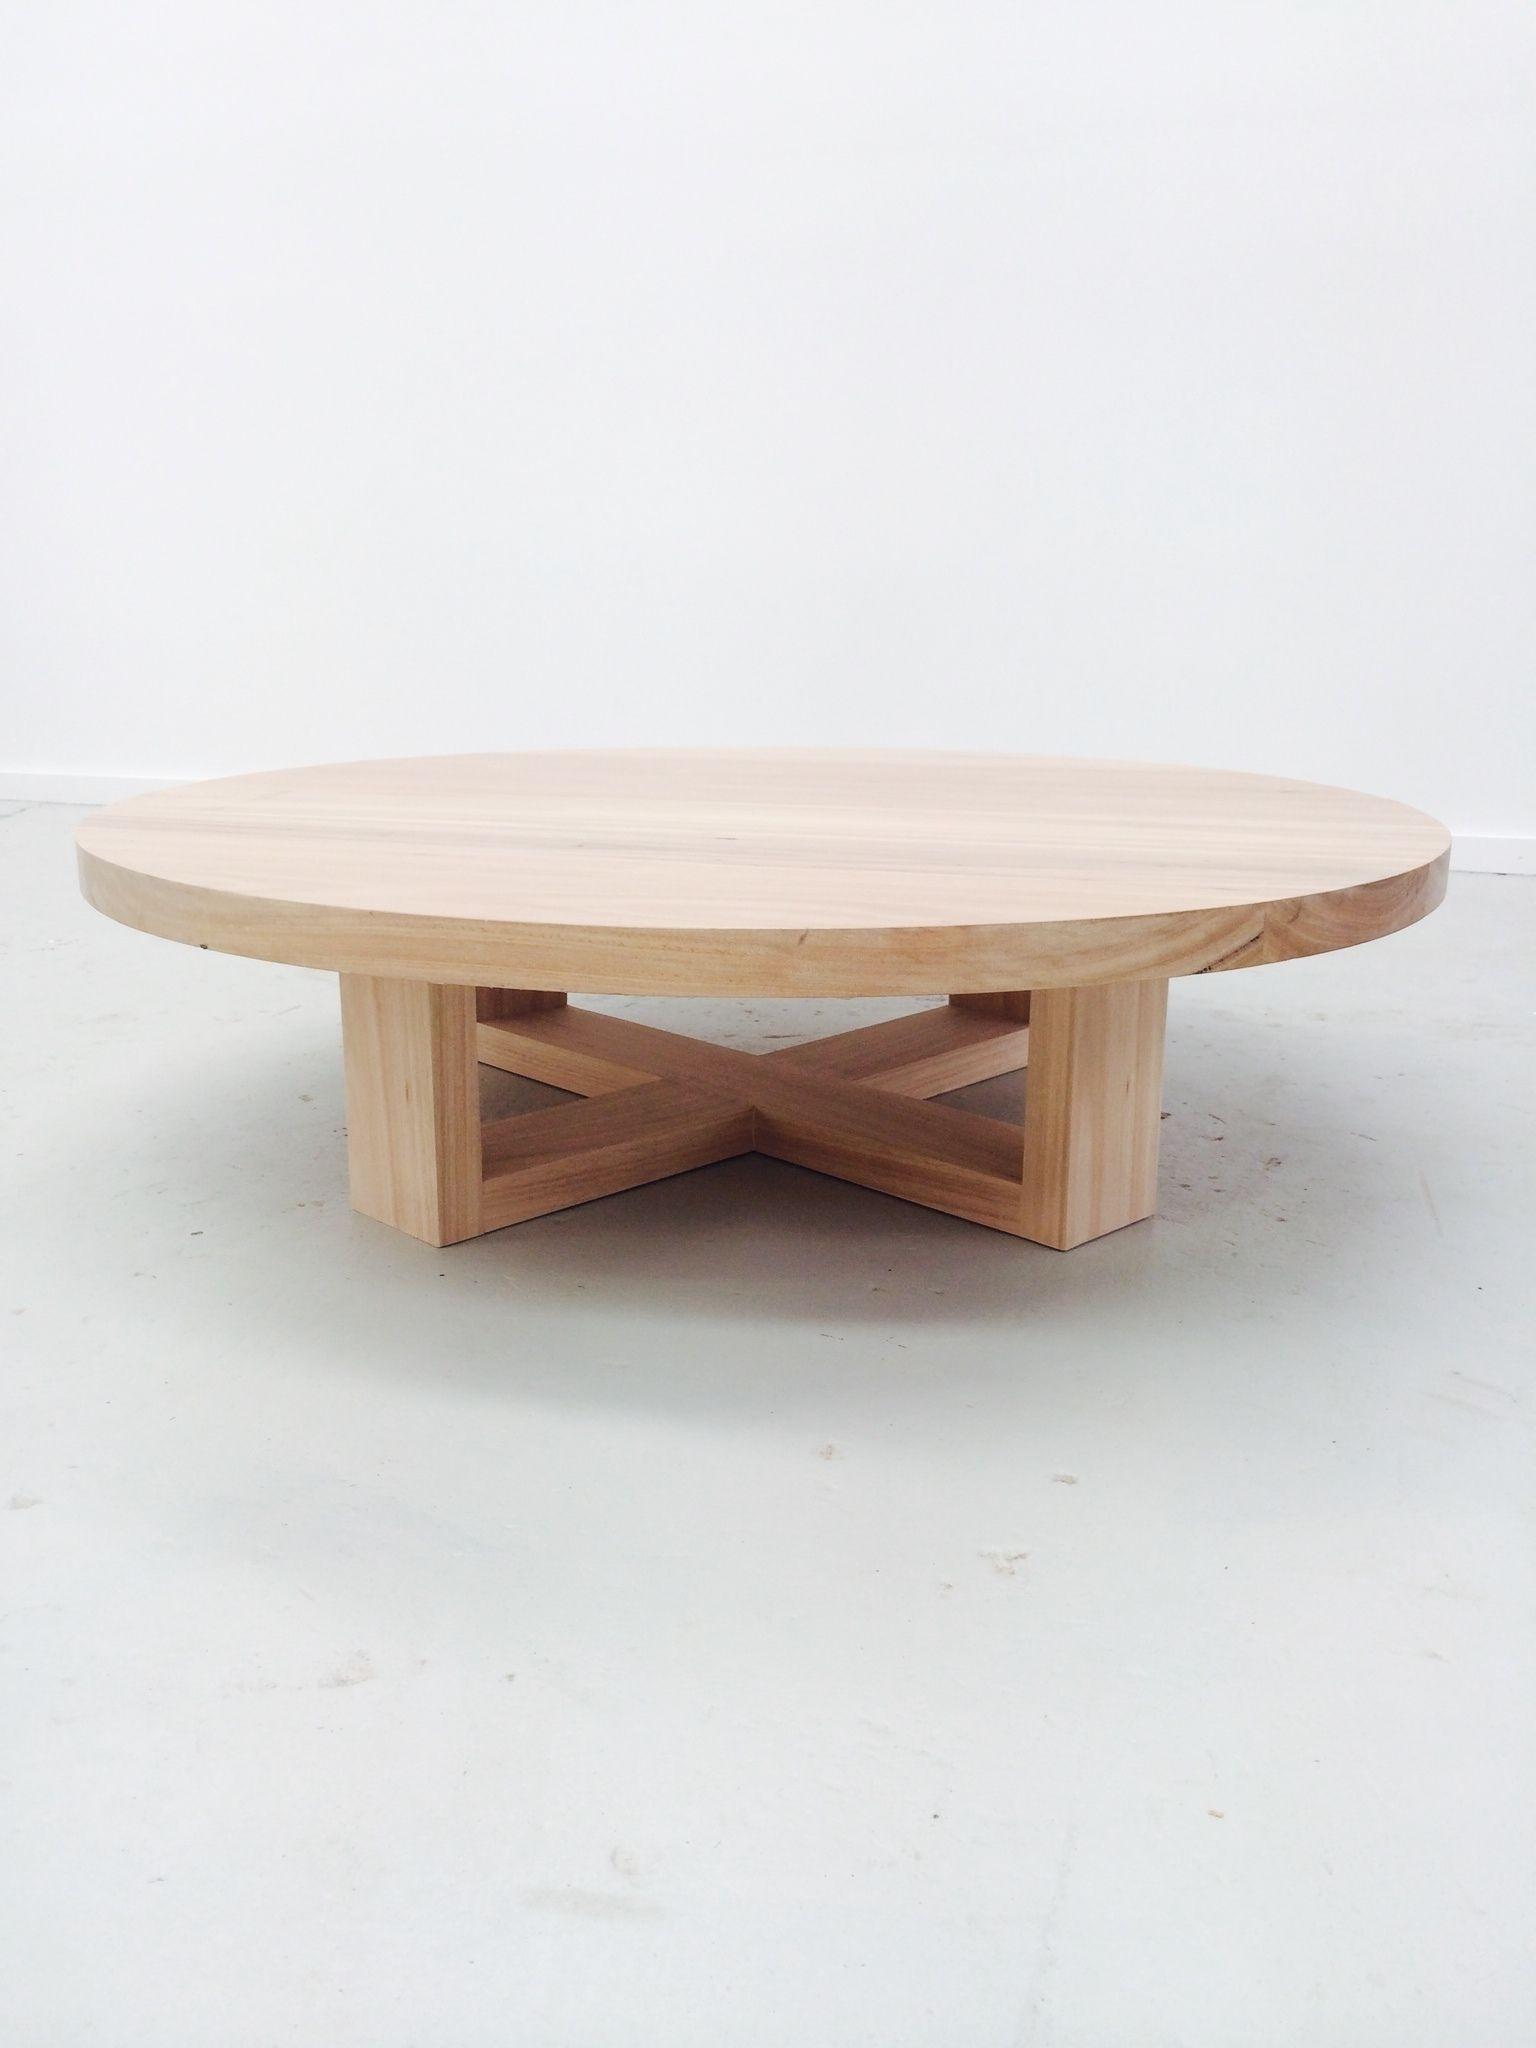 Cb2 Big Dipper Arc Floor Lamp Elegant Mark Tuckey American Oak Regarding Famous Joni Brass And Wood Coffee Tables (View 11 of 20)